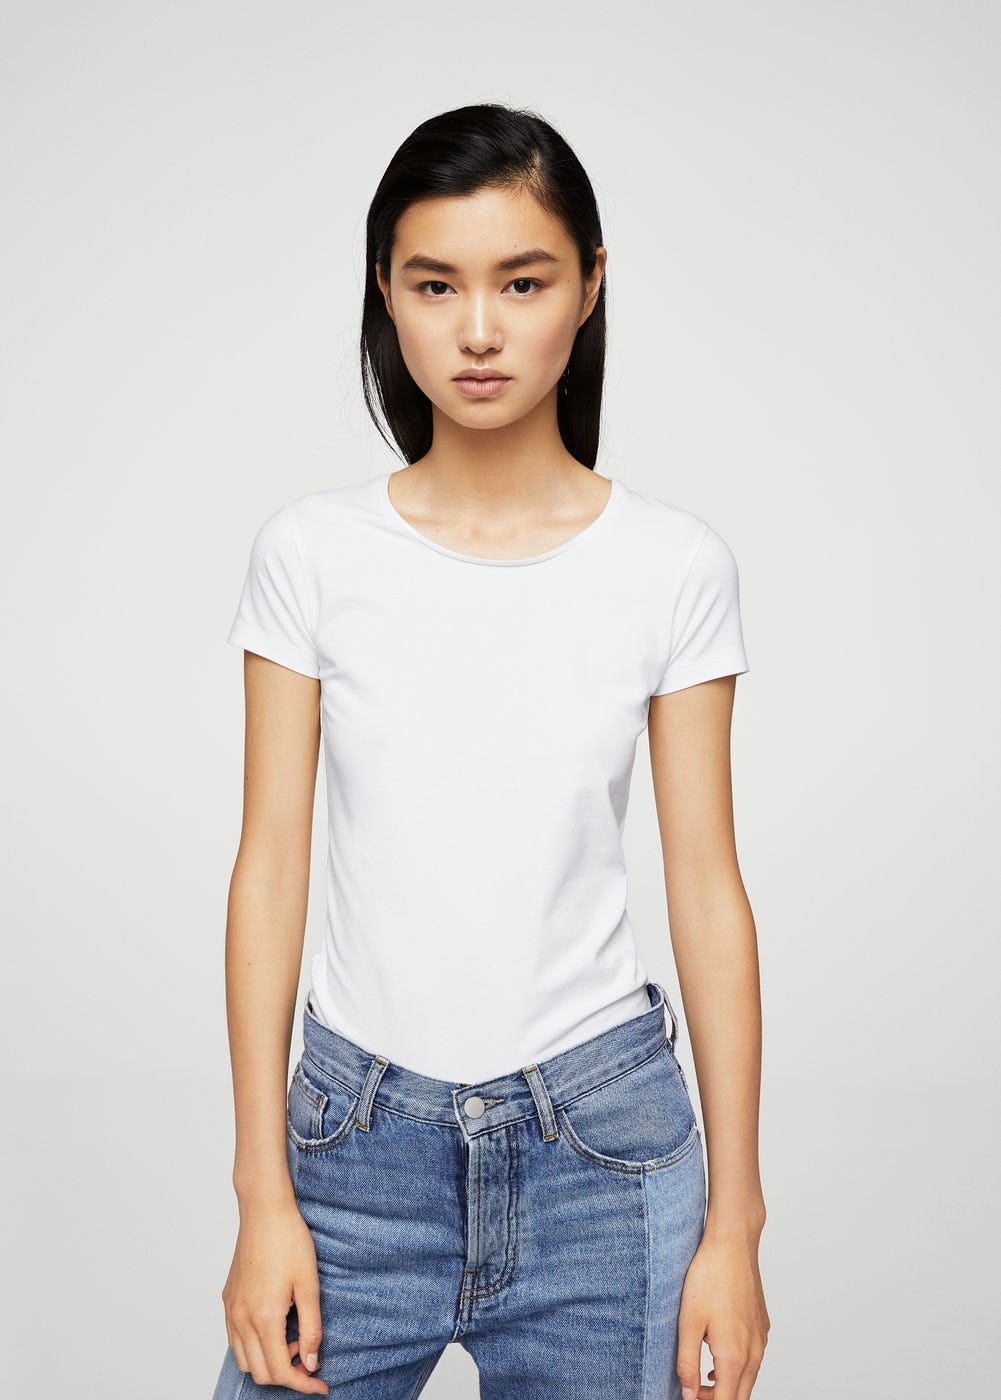 d1f8f00653c1 Best White T Shirts- Gap, Reformation, Everlane, Hanes